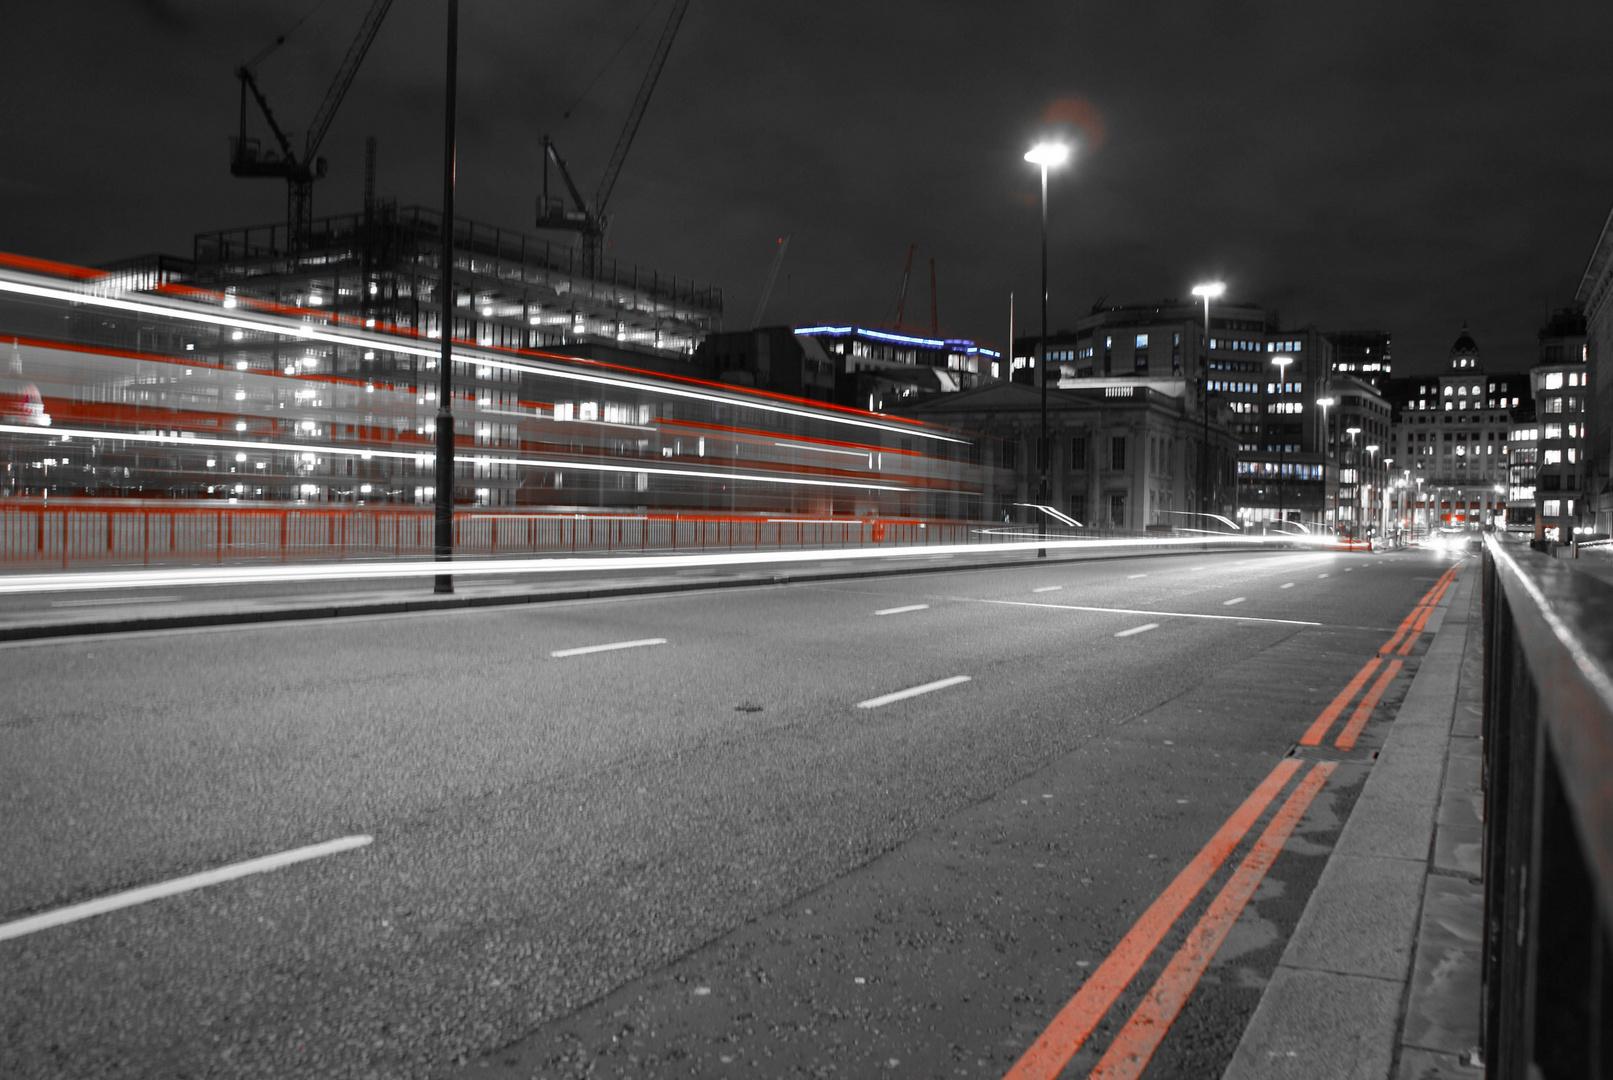 Walking on the London Bridge